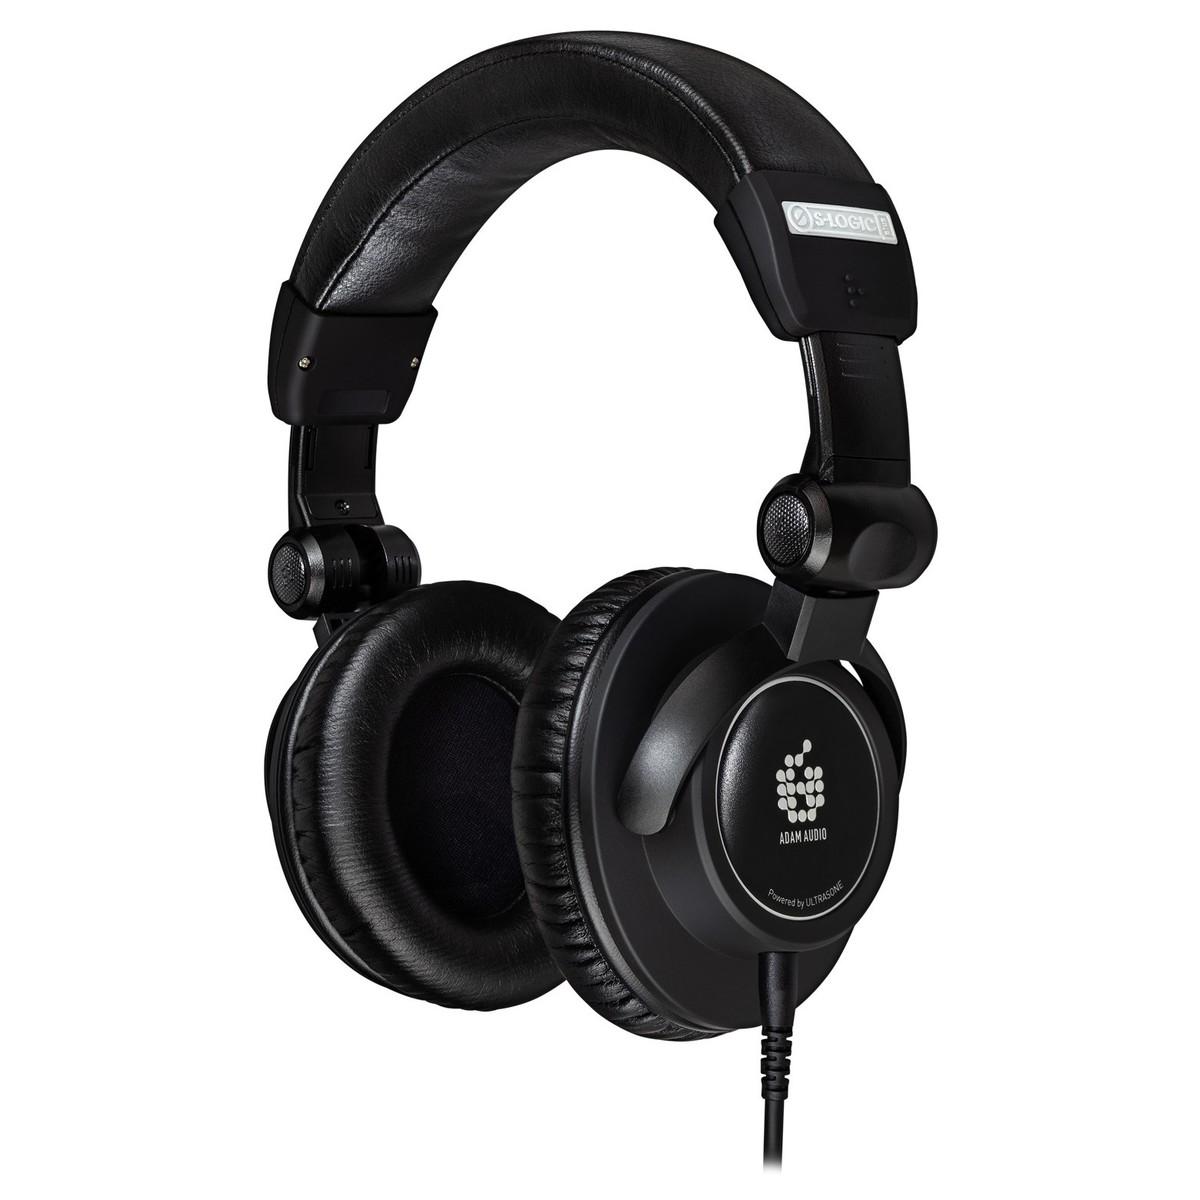 ADAM Audio Pro SP-5 Studio Headphones